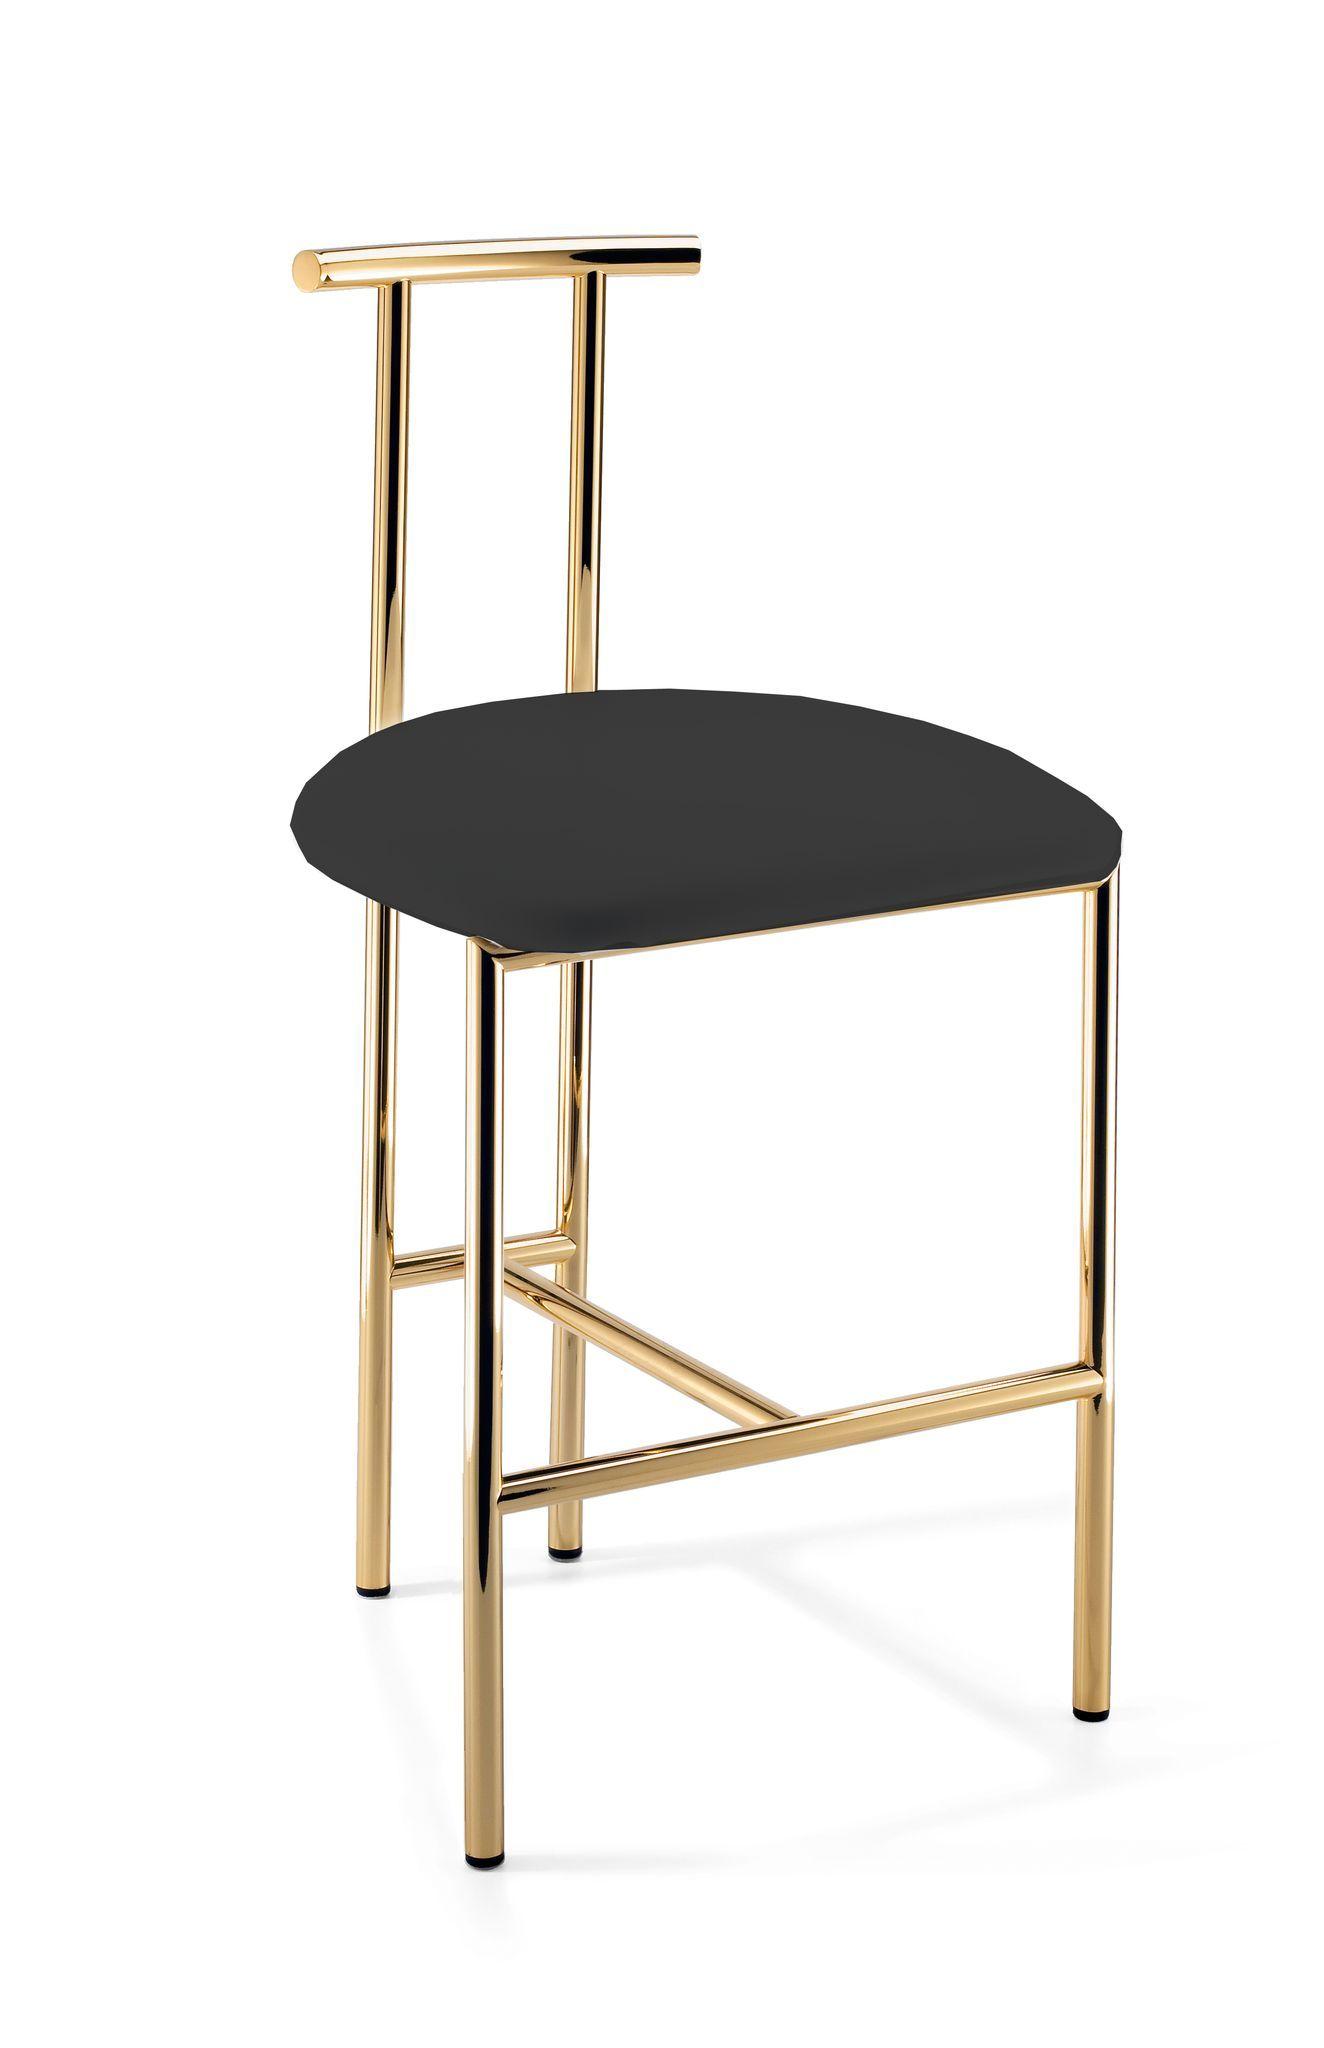 dwba vanity bar stool bench with brass metal legs back 18 5 inch tabouret